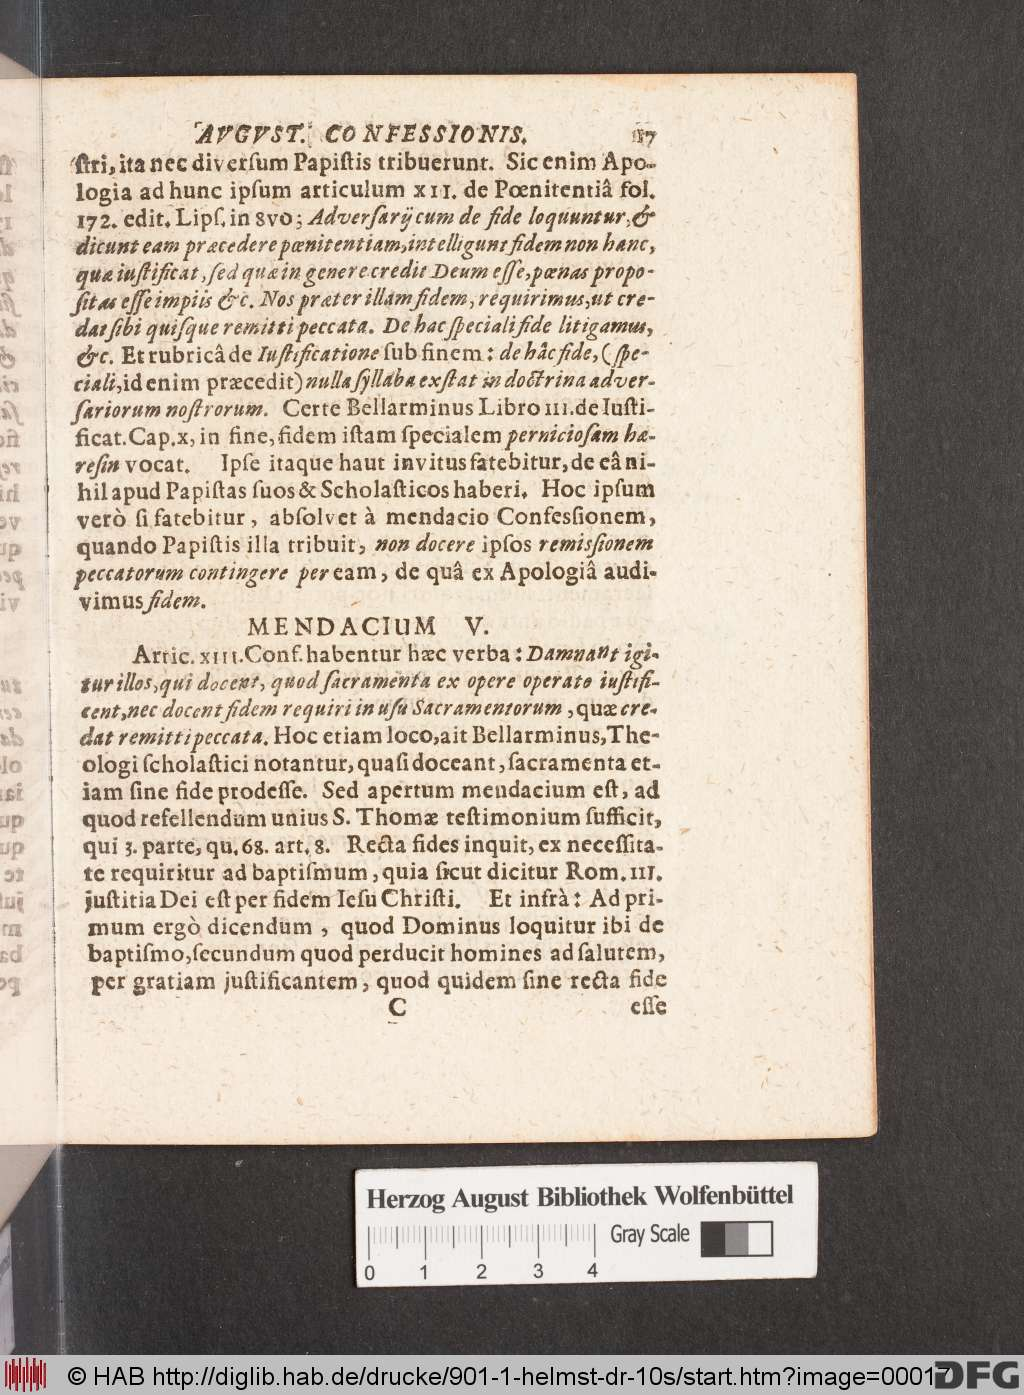 http://diglib.hab.de/drucke/901-1-helmst-dr-10s/00017.jpg